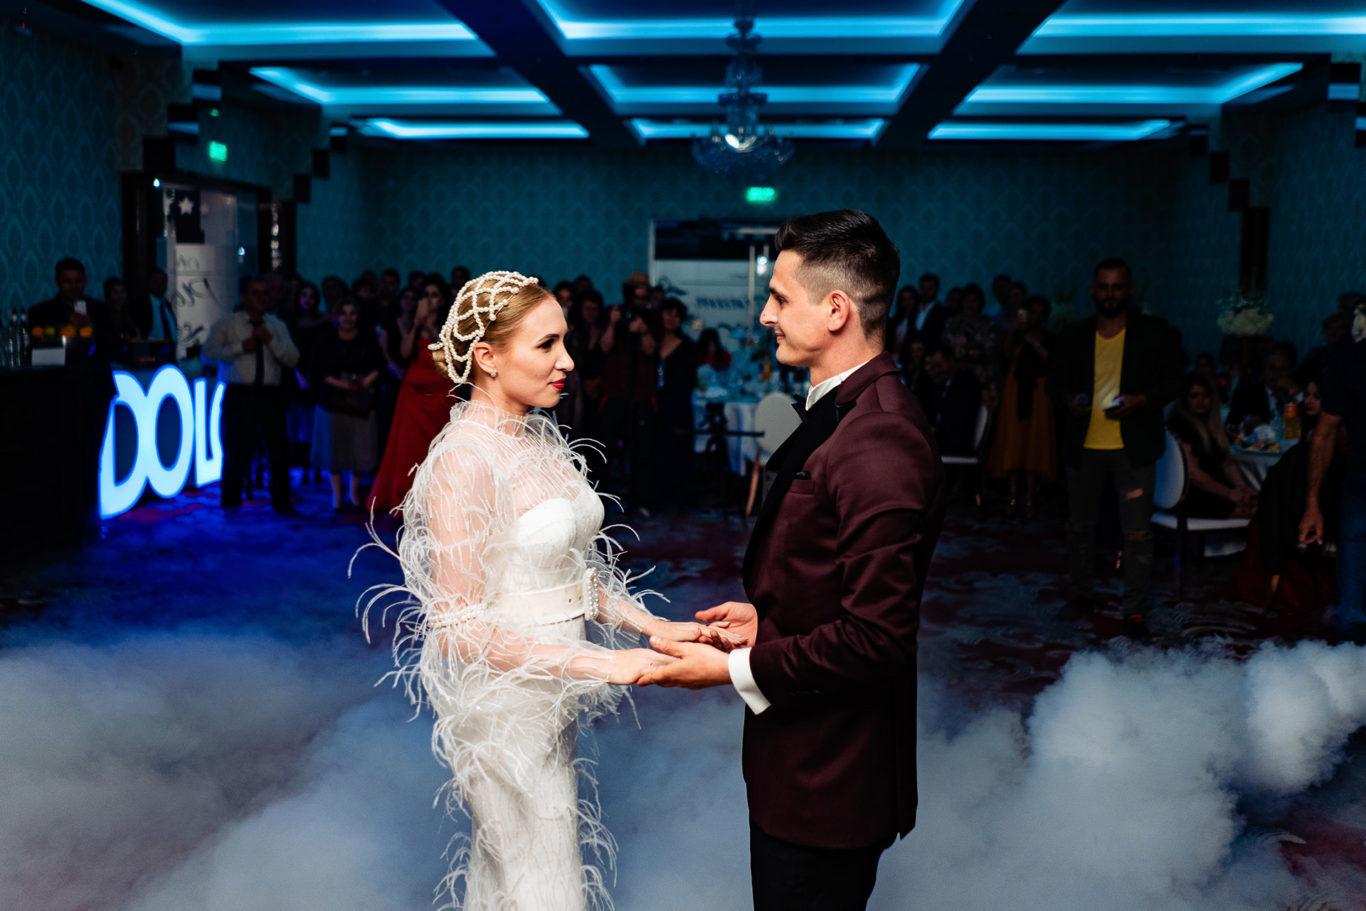 Nunta de poveste la Slatina - Alexandra si Ovidiu - fotograf Ciprian Dumitrescu